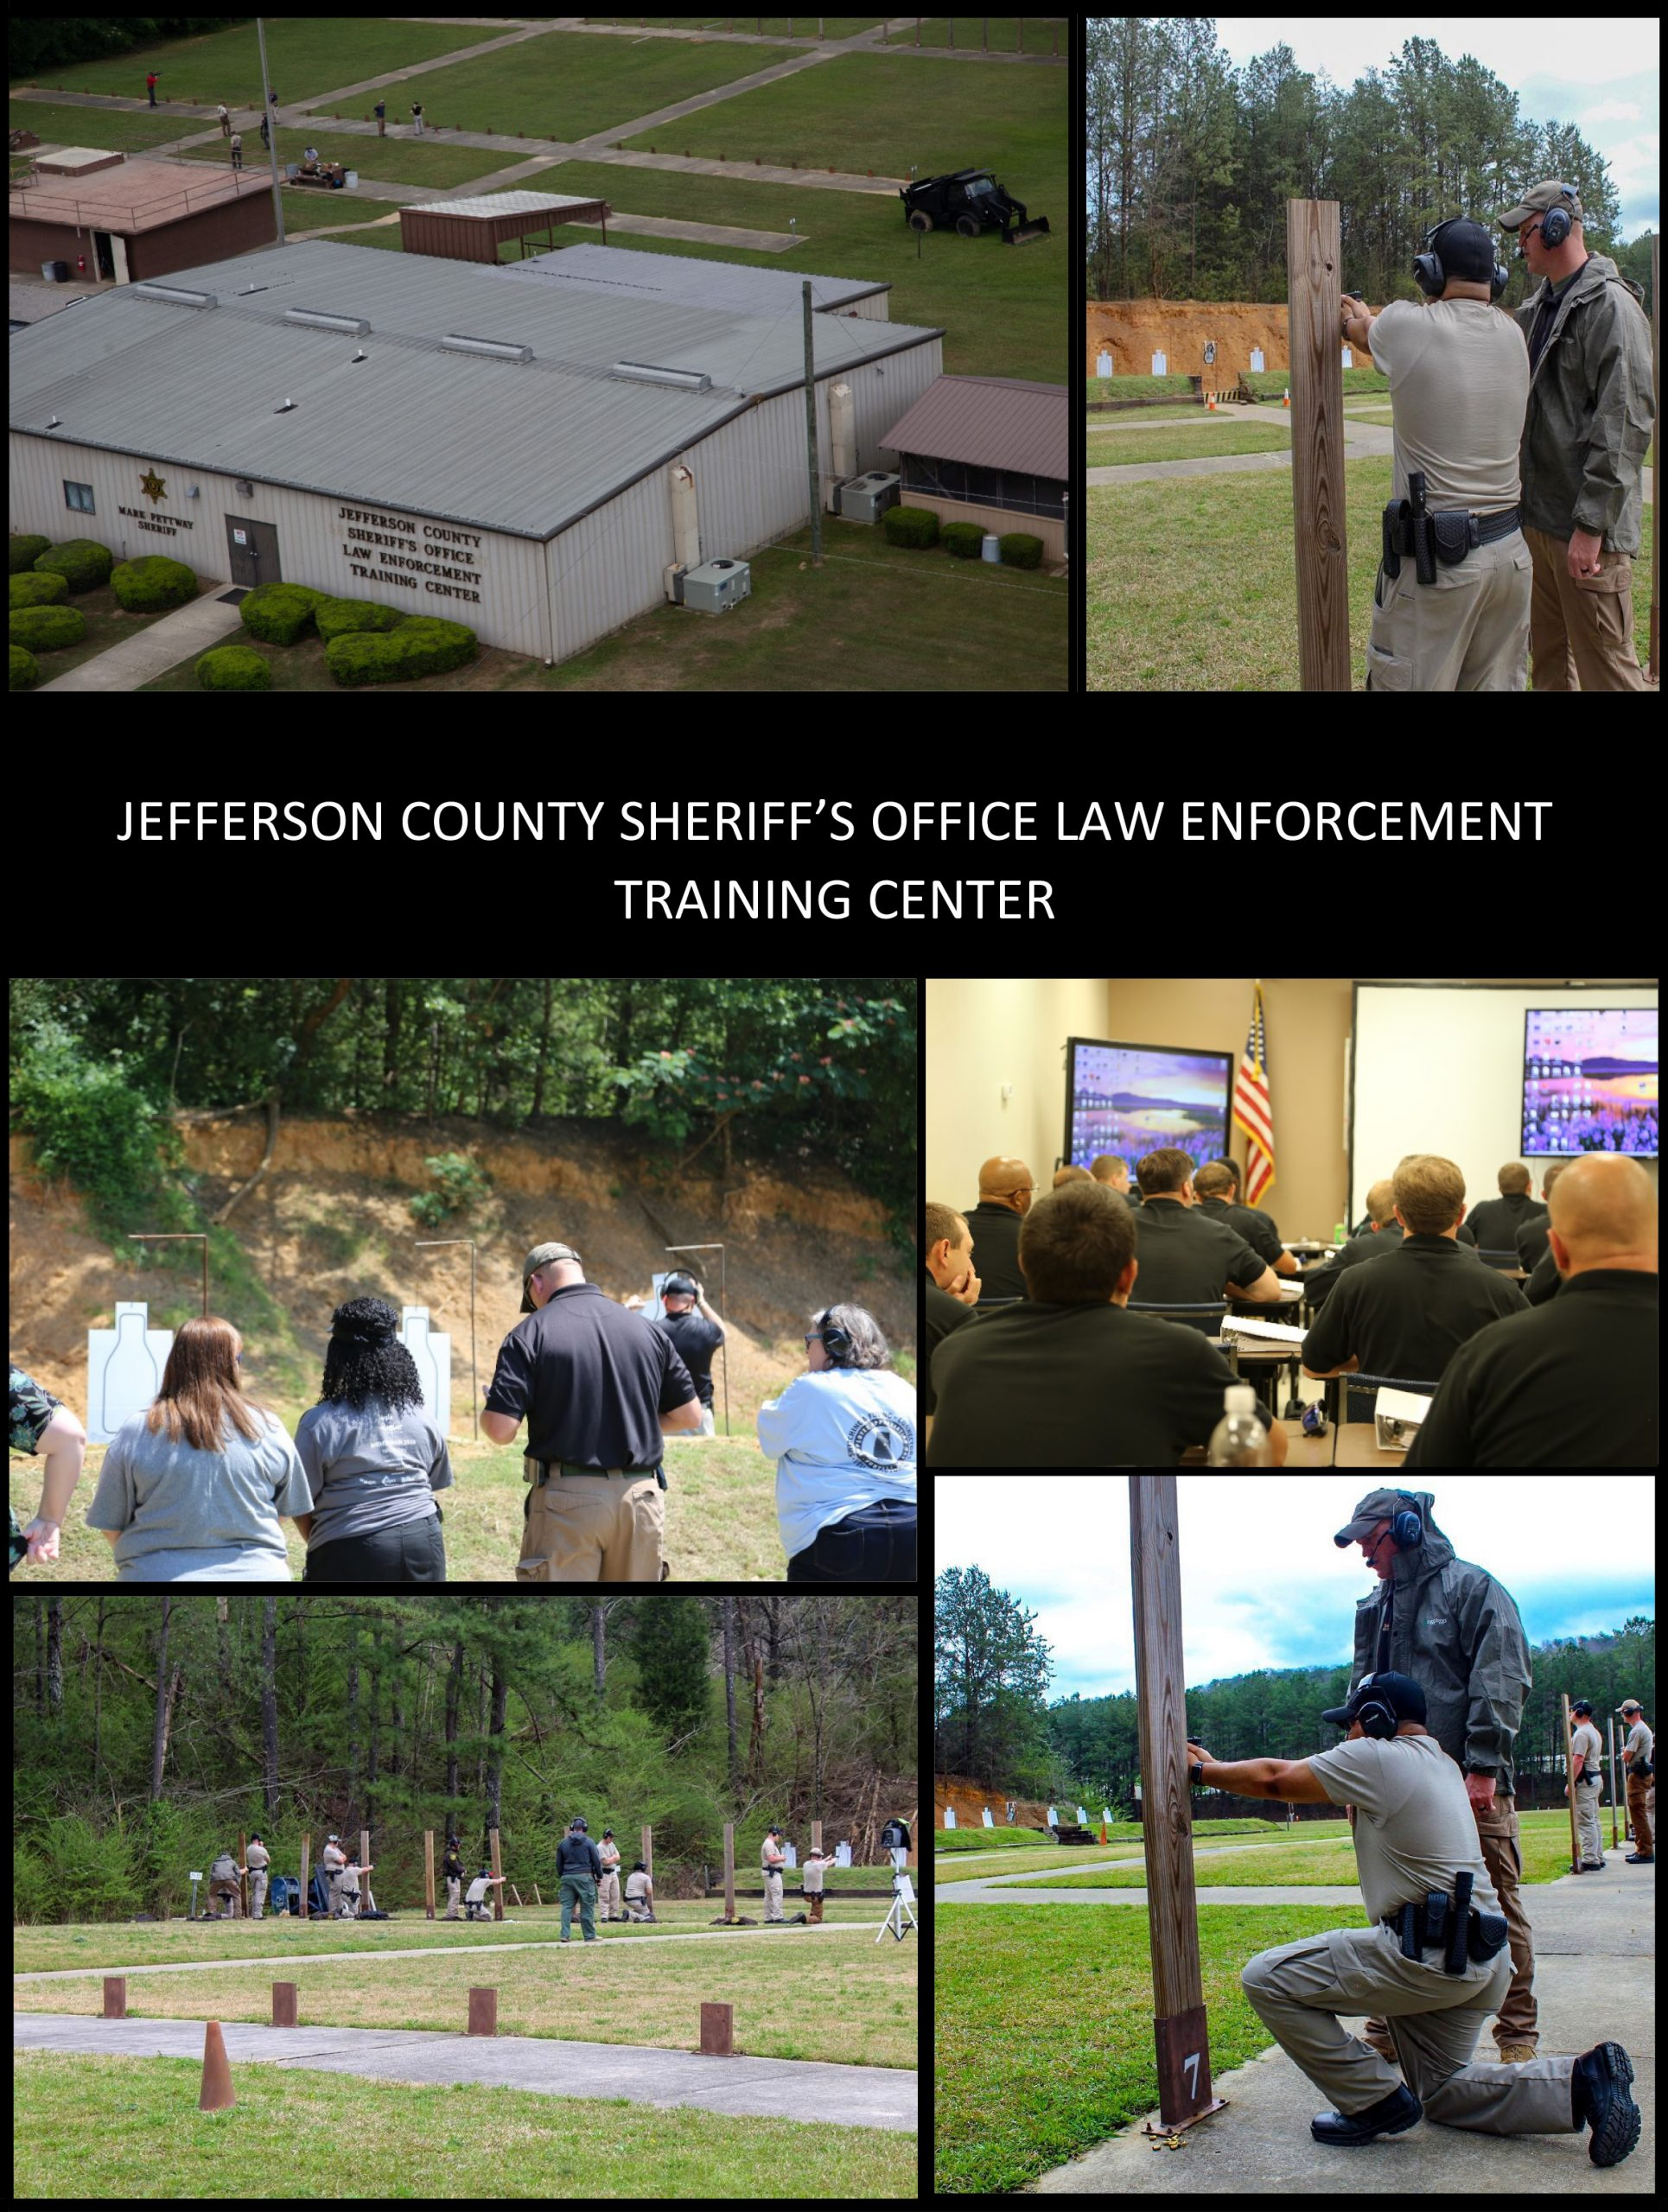 Jefferson-County-Sheriff-Dept-Alabama-Training-Academy-Collage